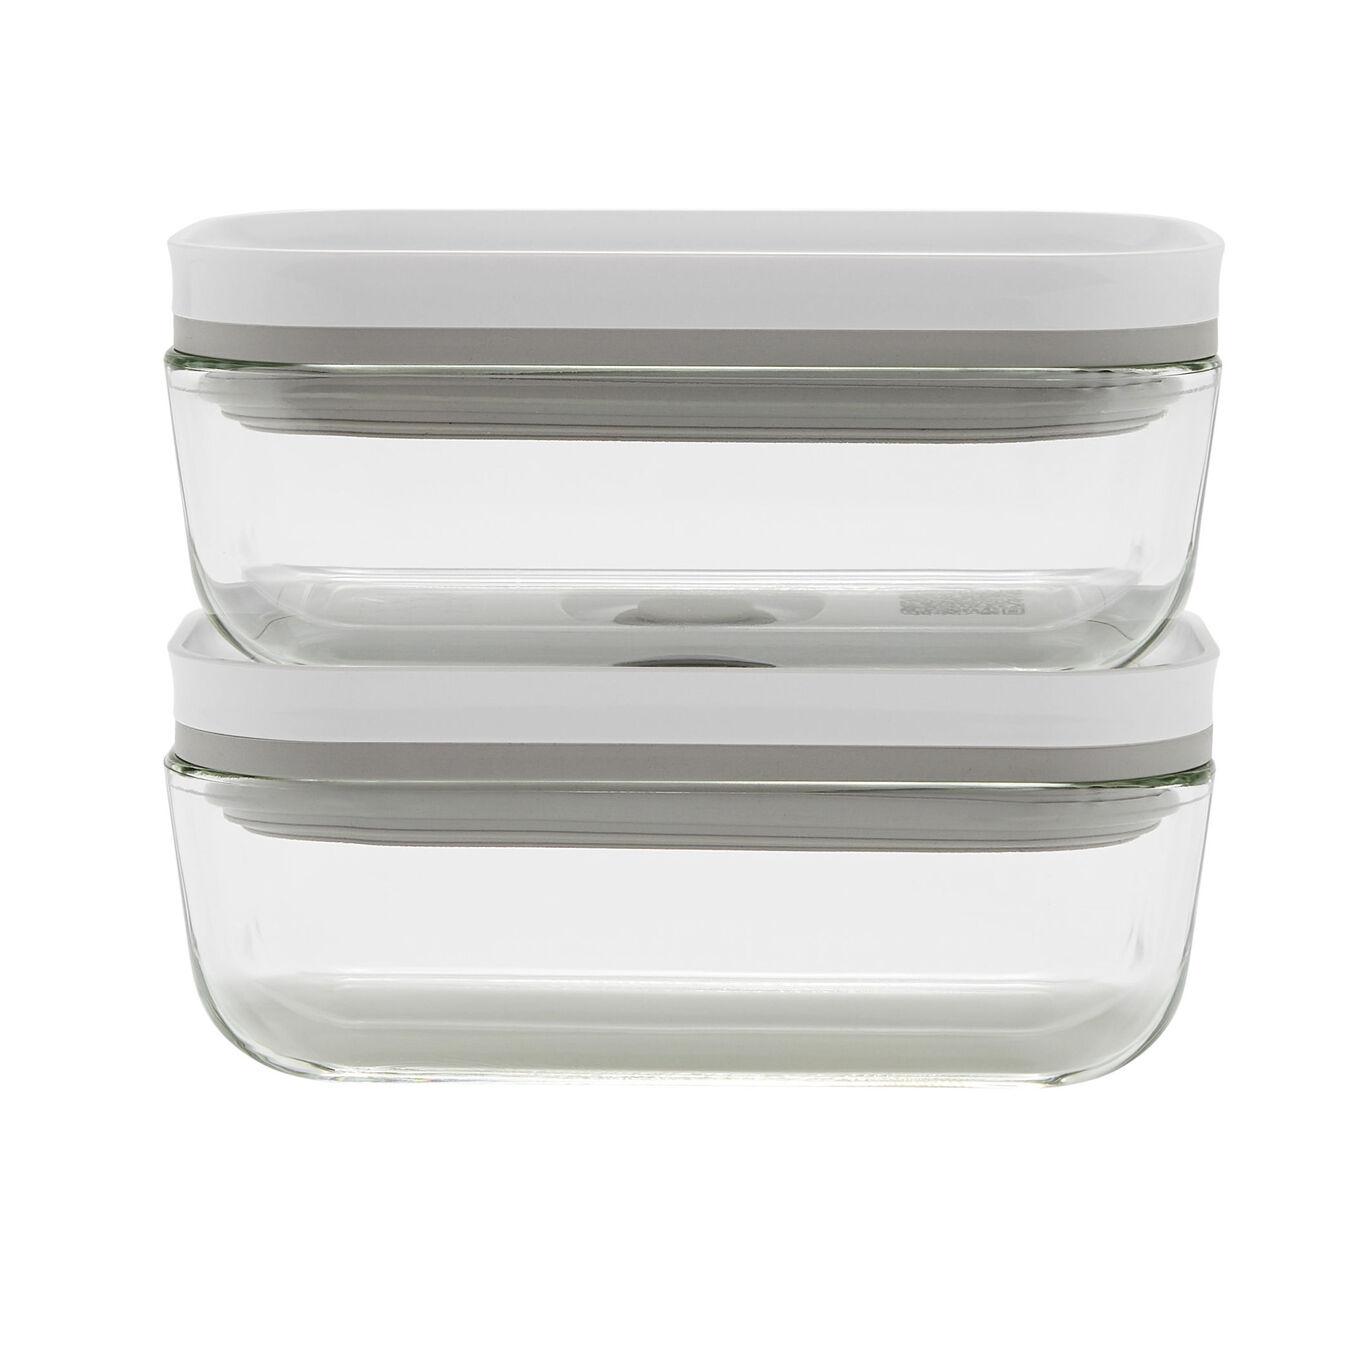 2 Piece Vacuum box set, glass, grey,,large 1